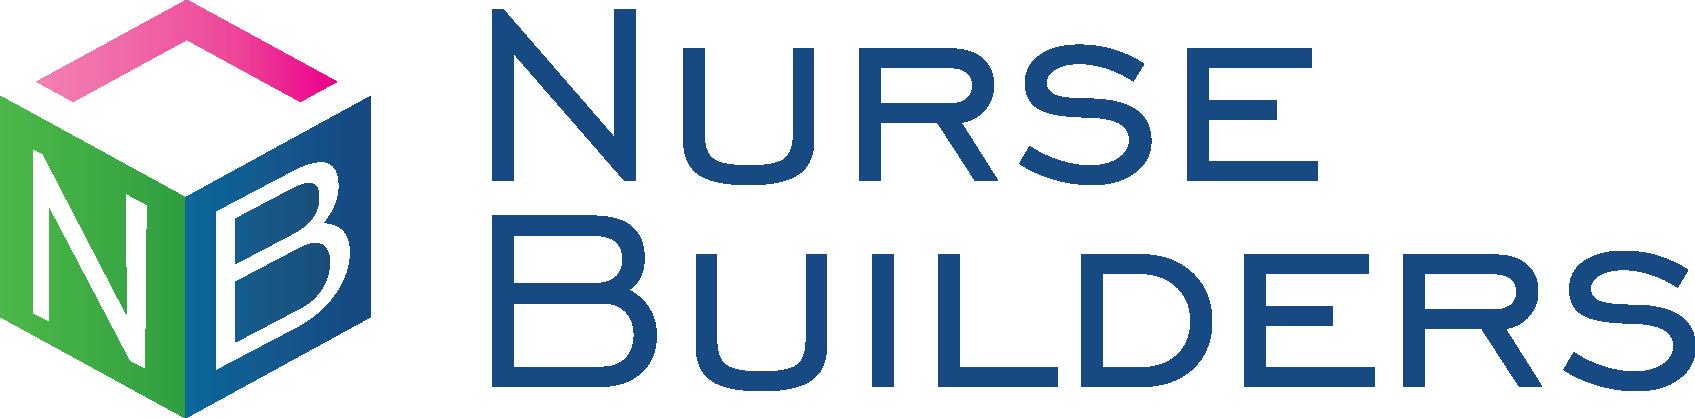 Nurse Builders E-Course Academy